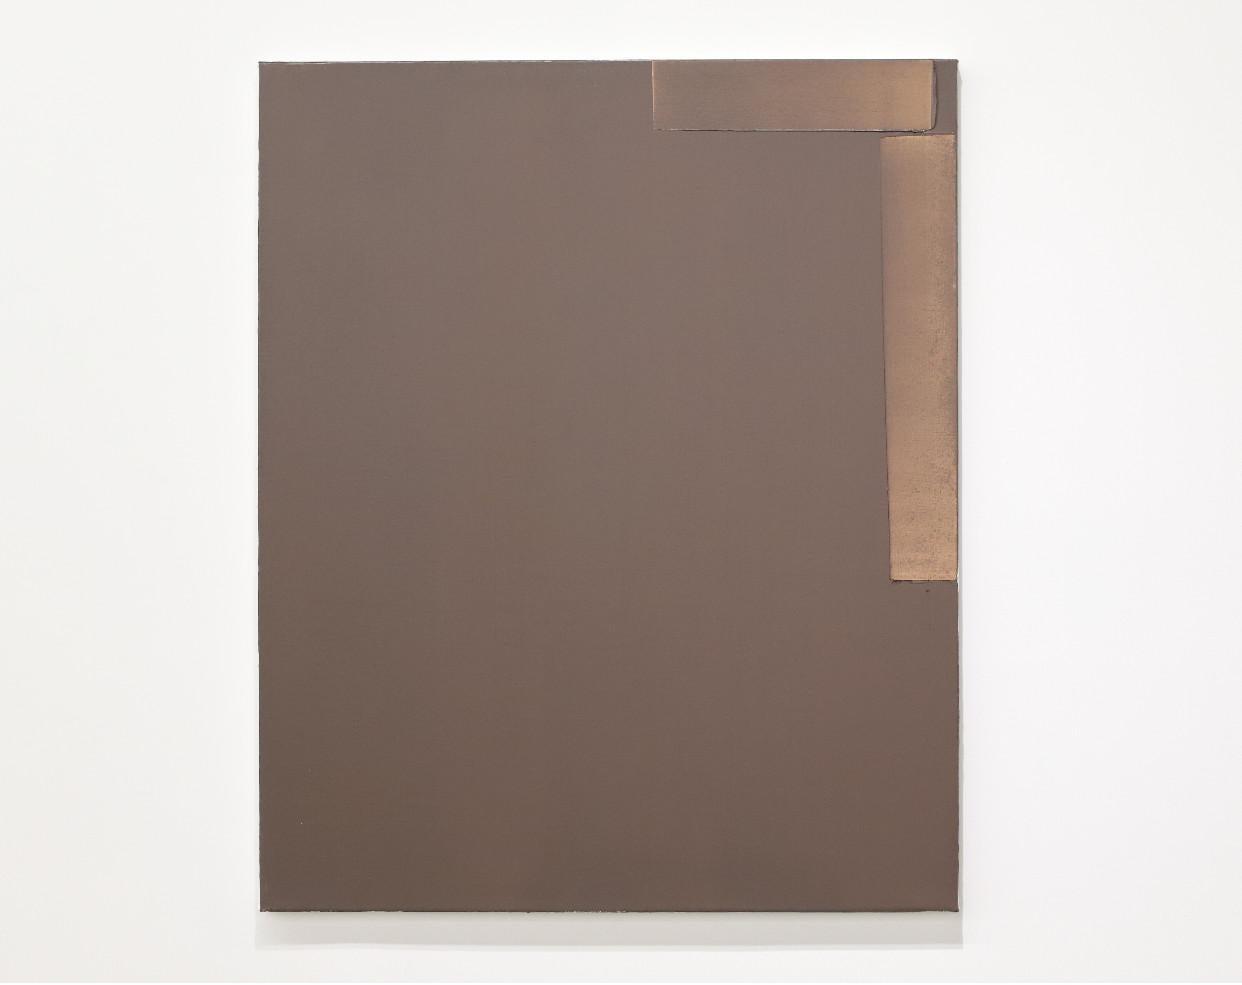 Contemporary minimalist oil painting by GJ Kimsunken 'Figuration 19.7' Chocolate